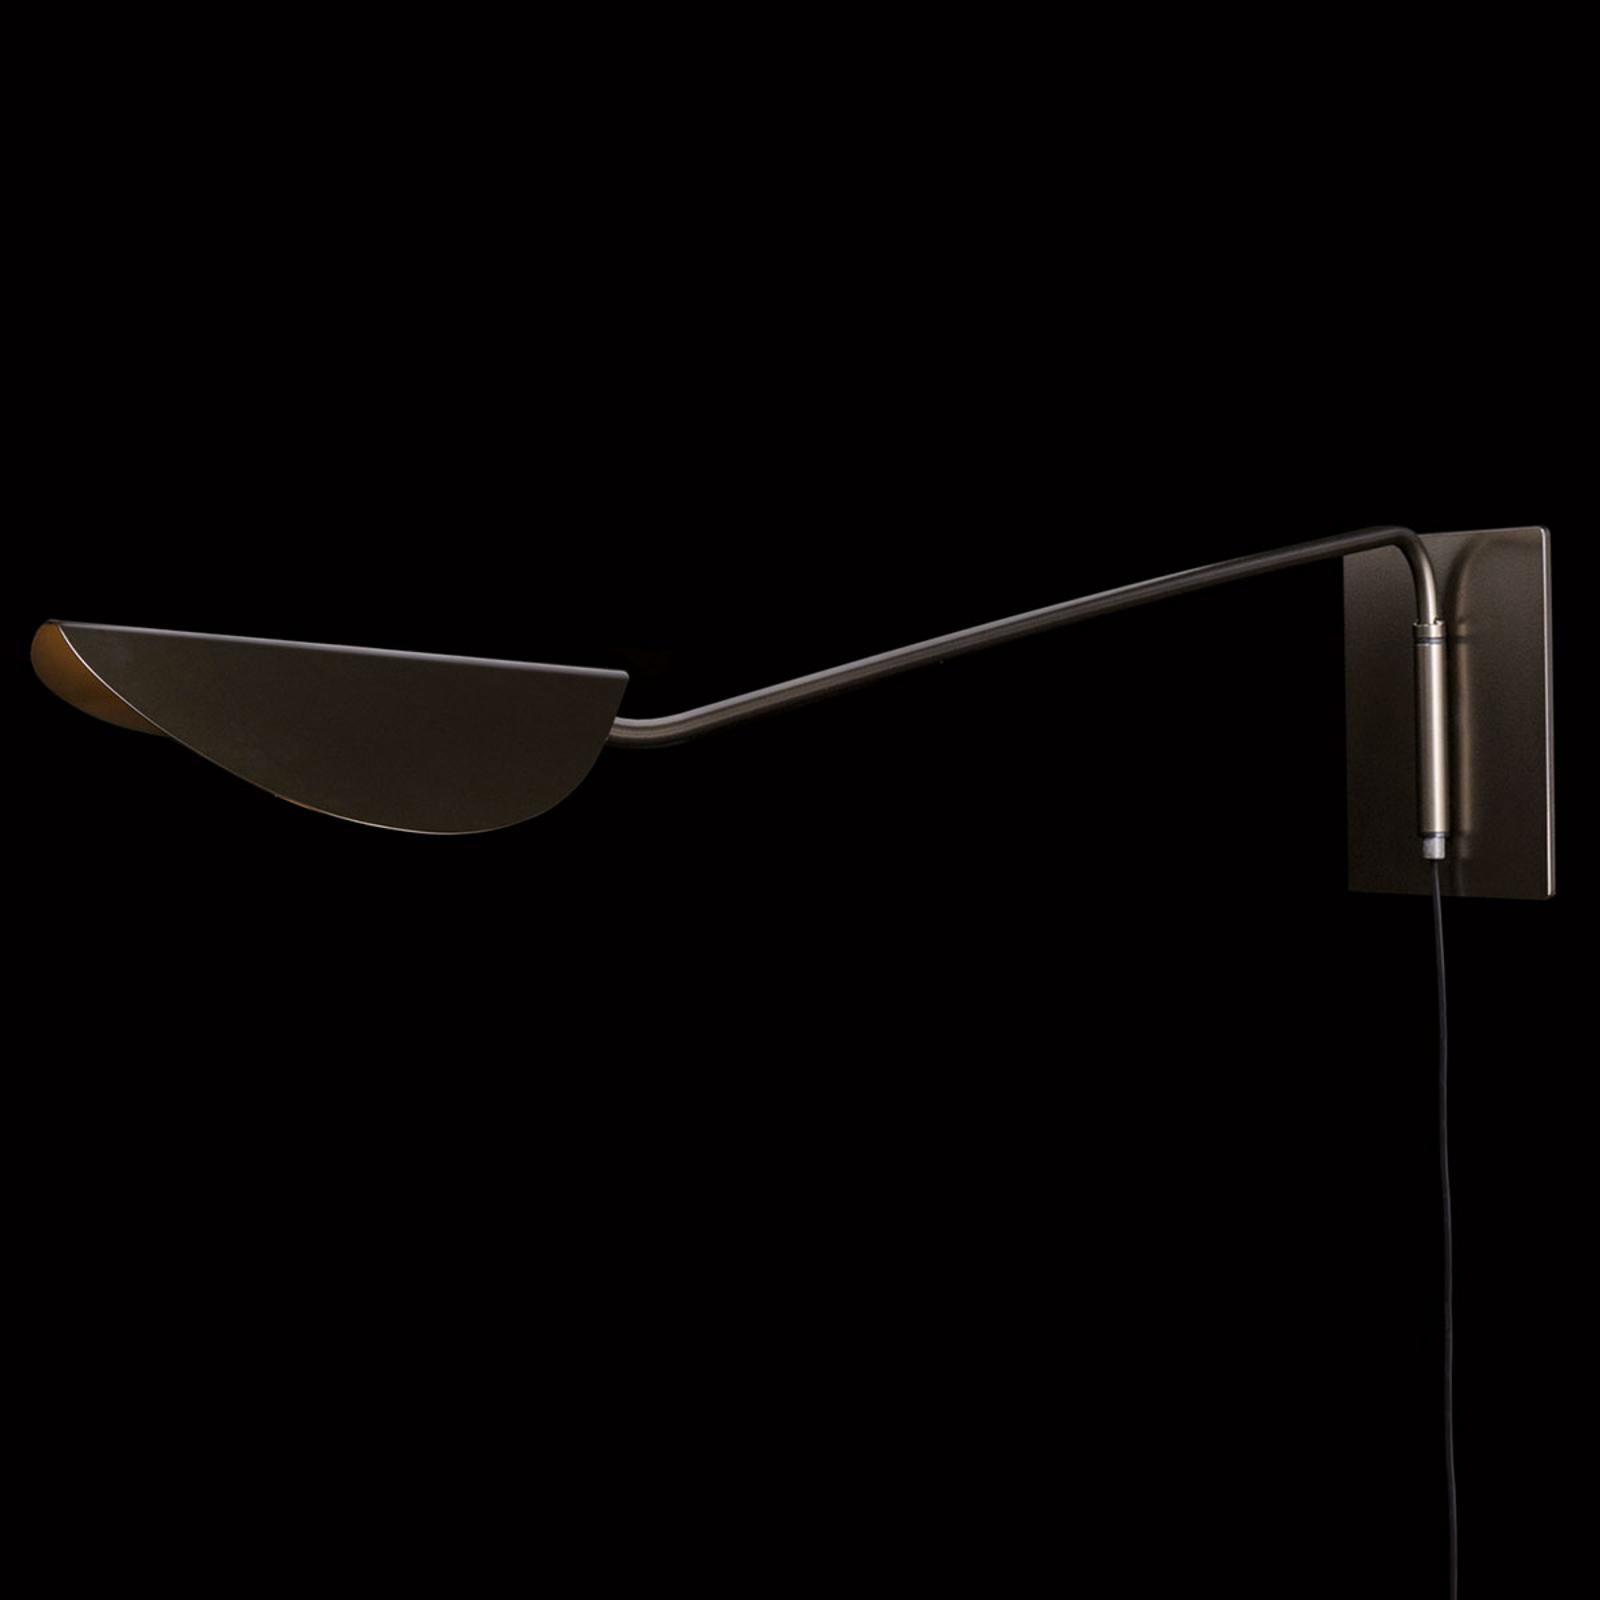 Oluce Plume applique - profondeur 160cm